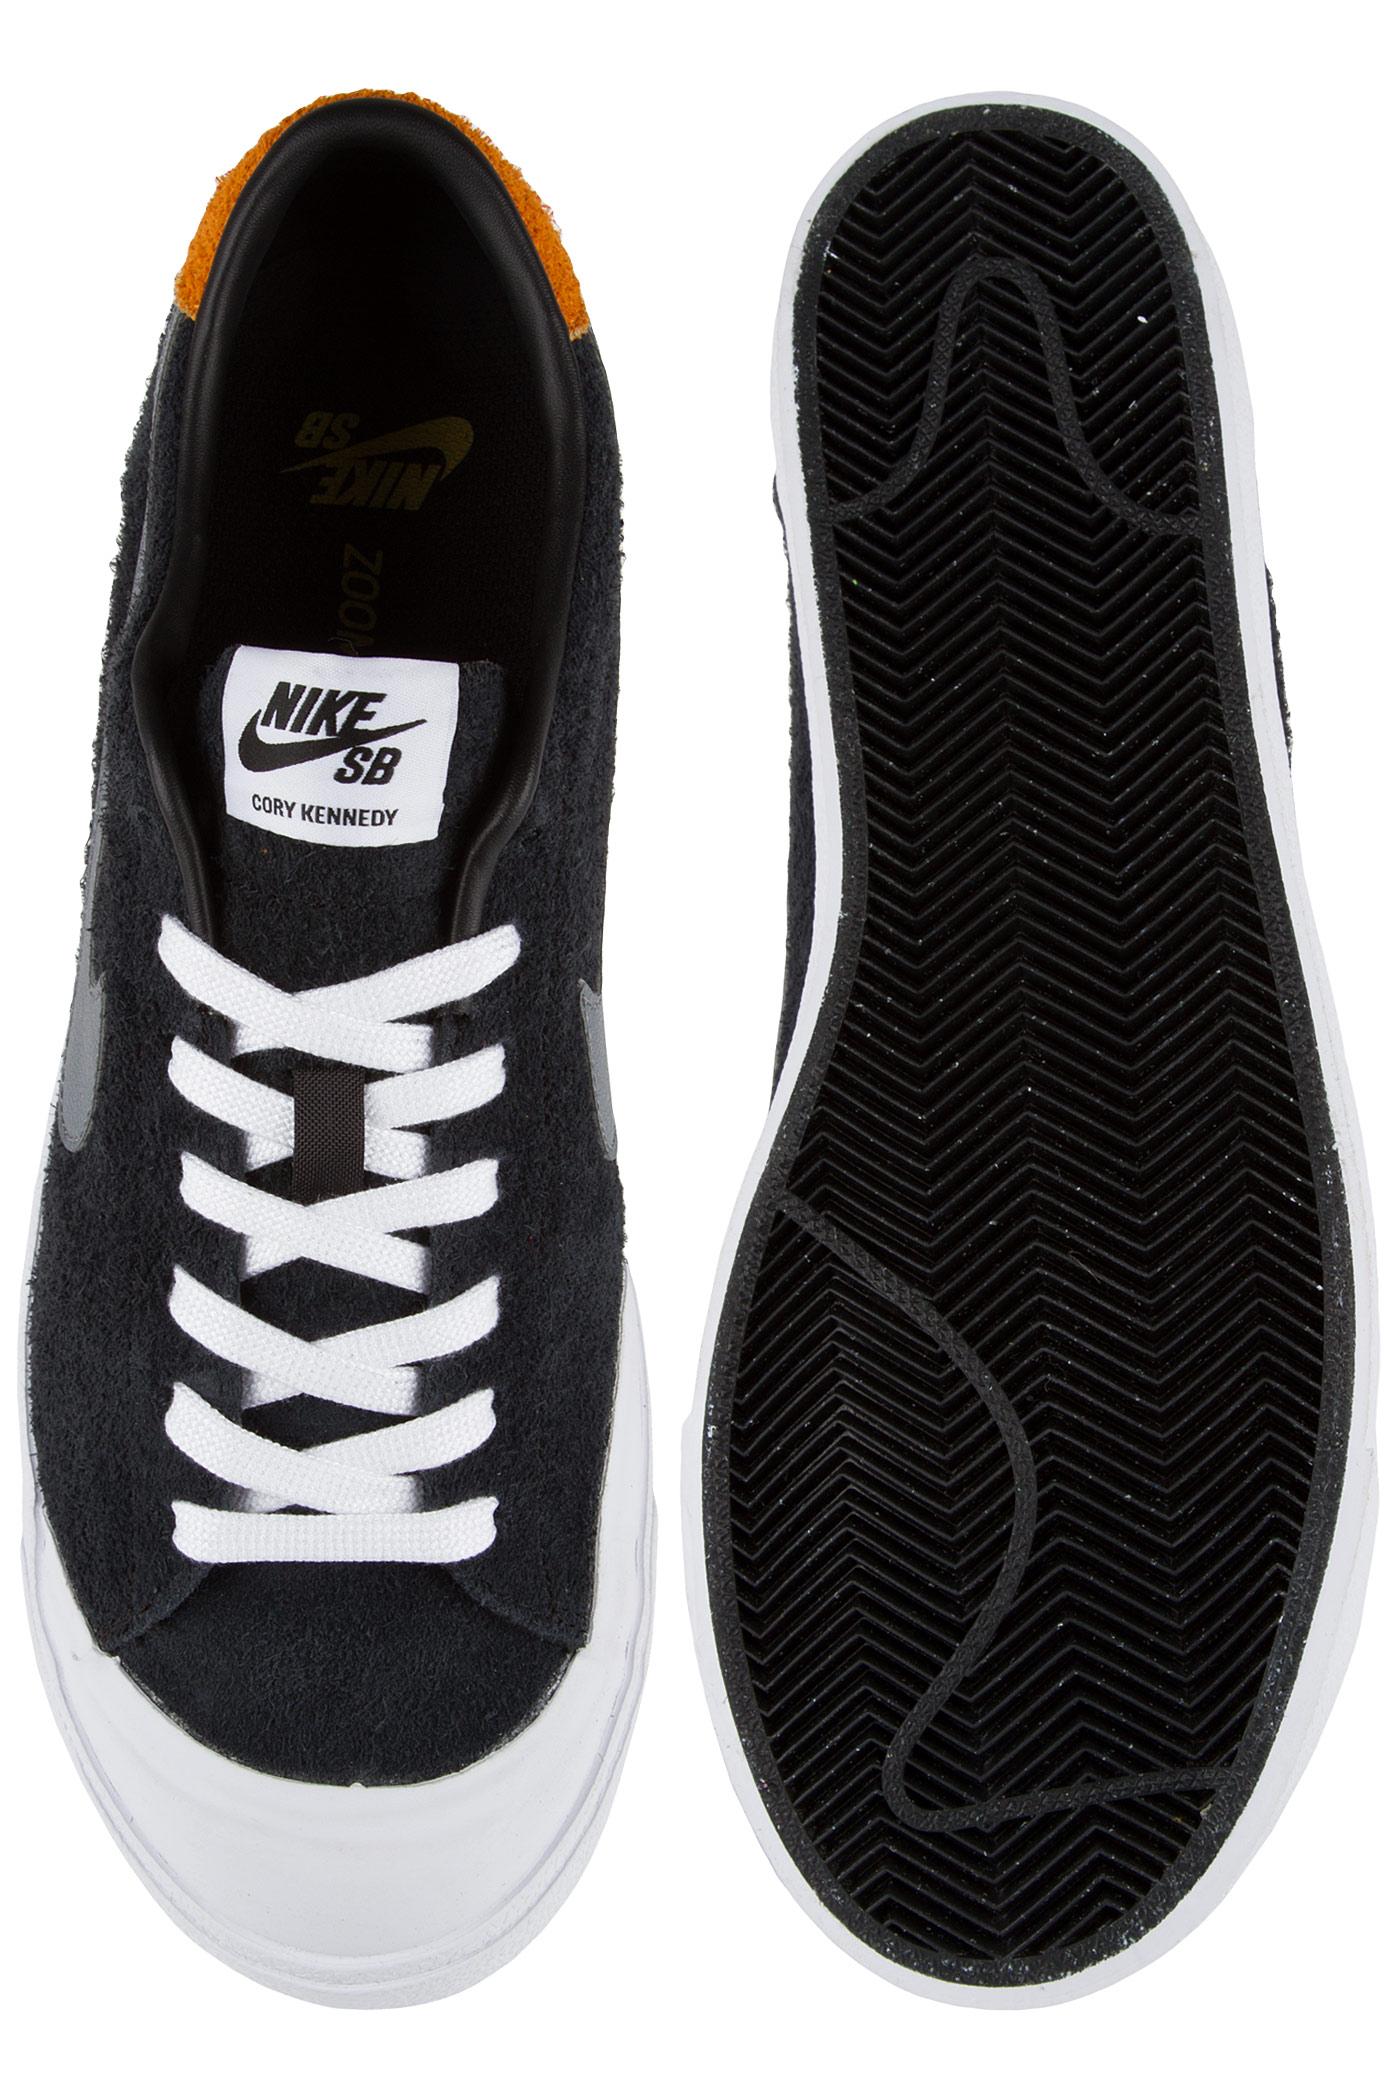 Cory Kennedy Shoes